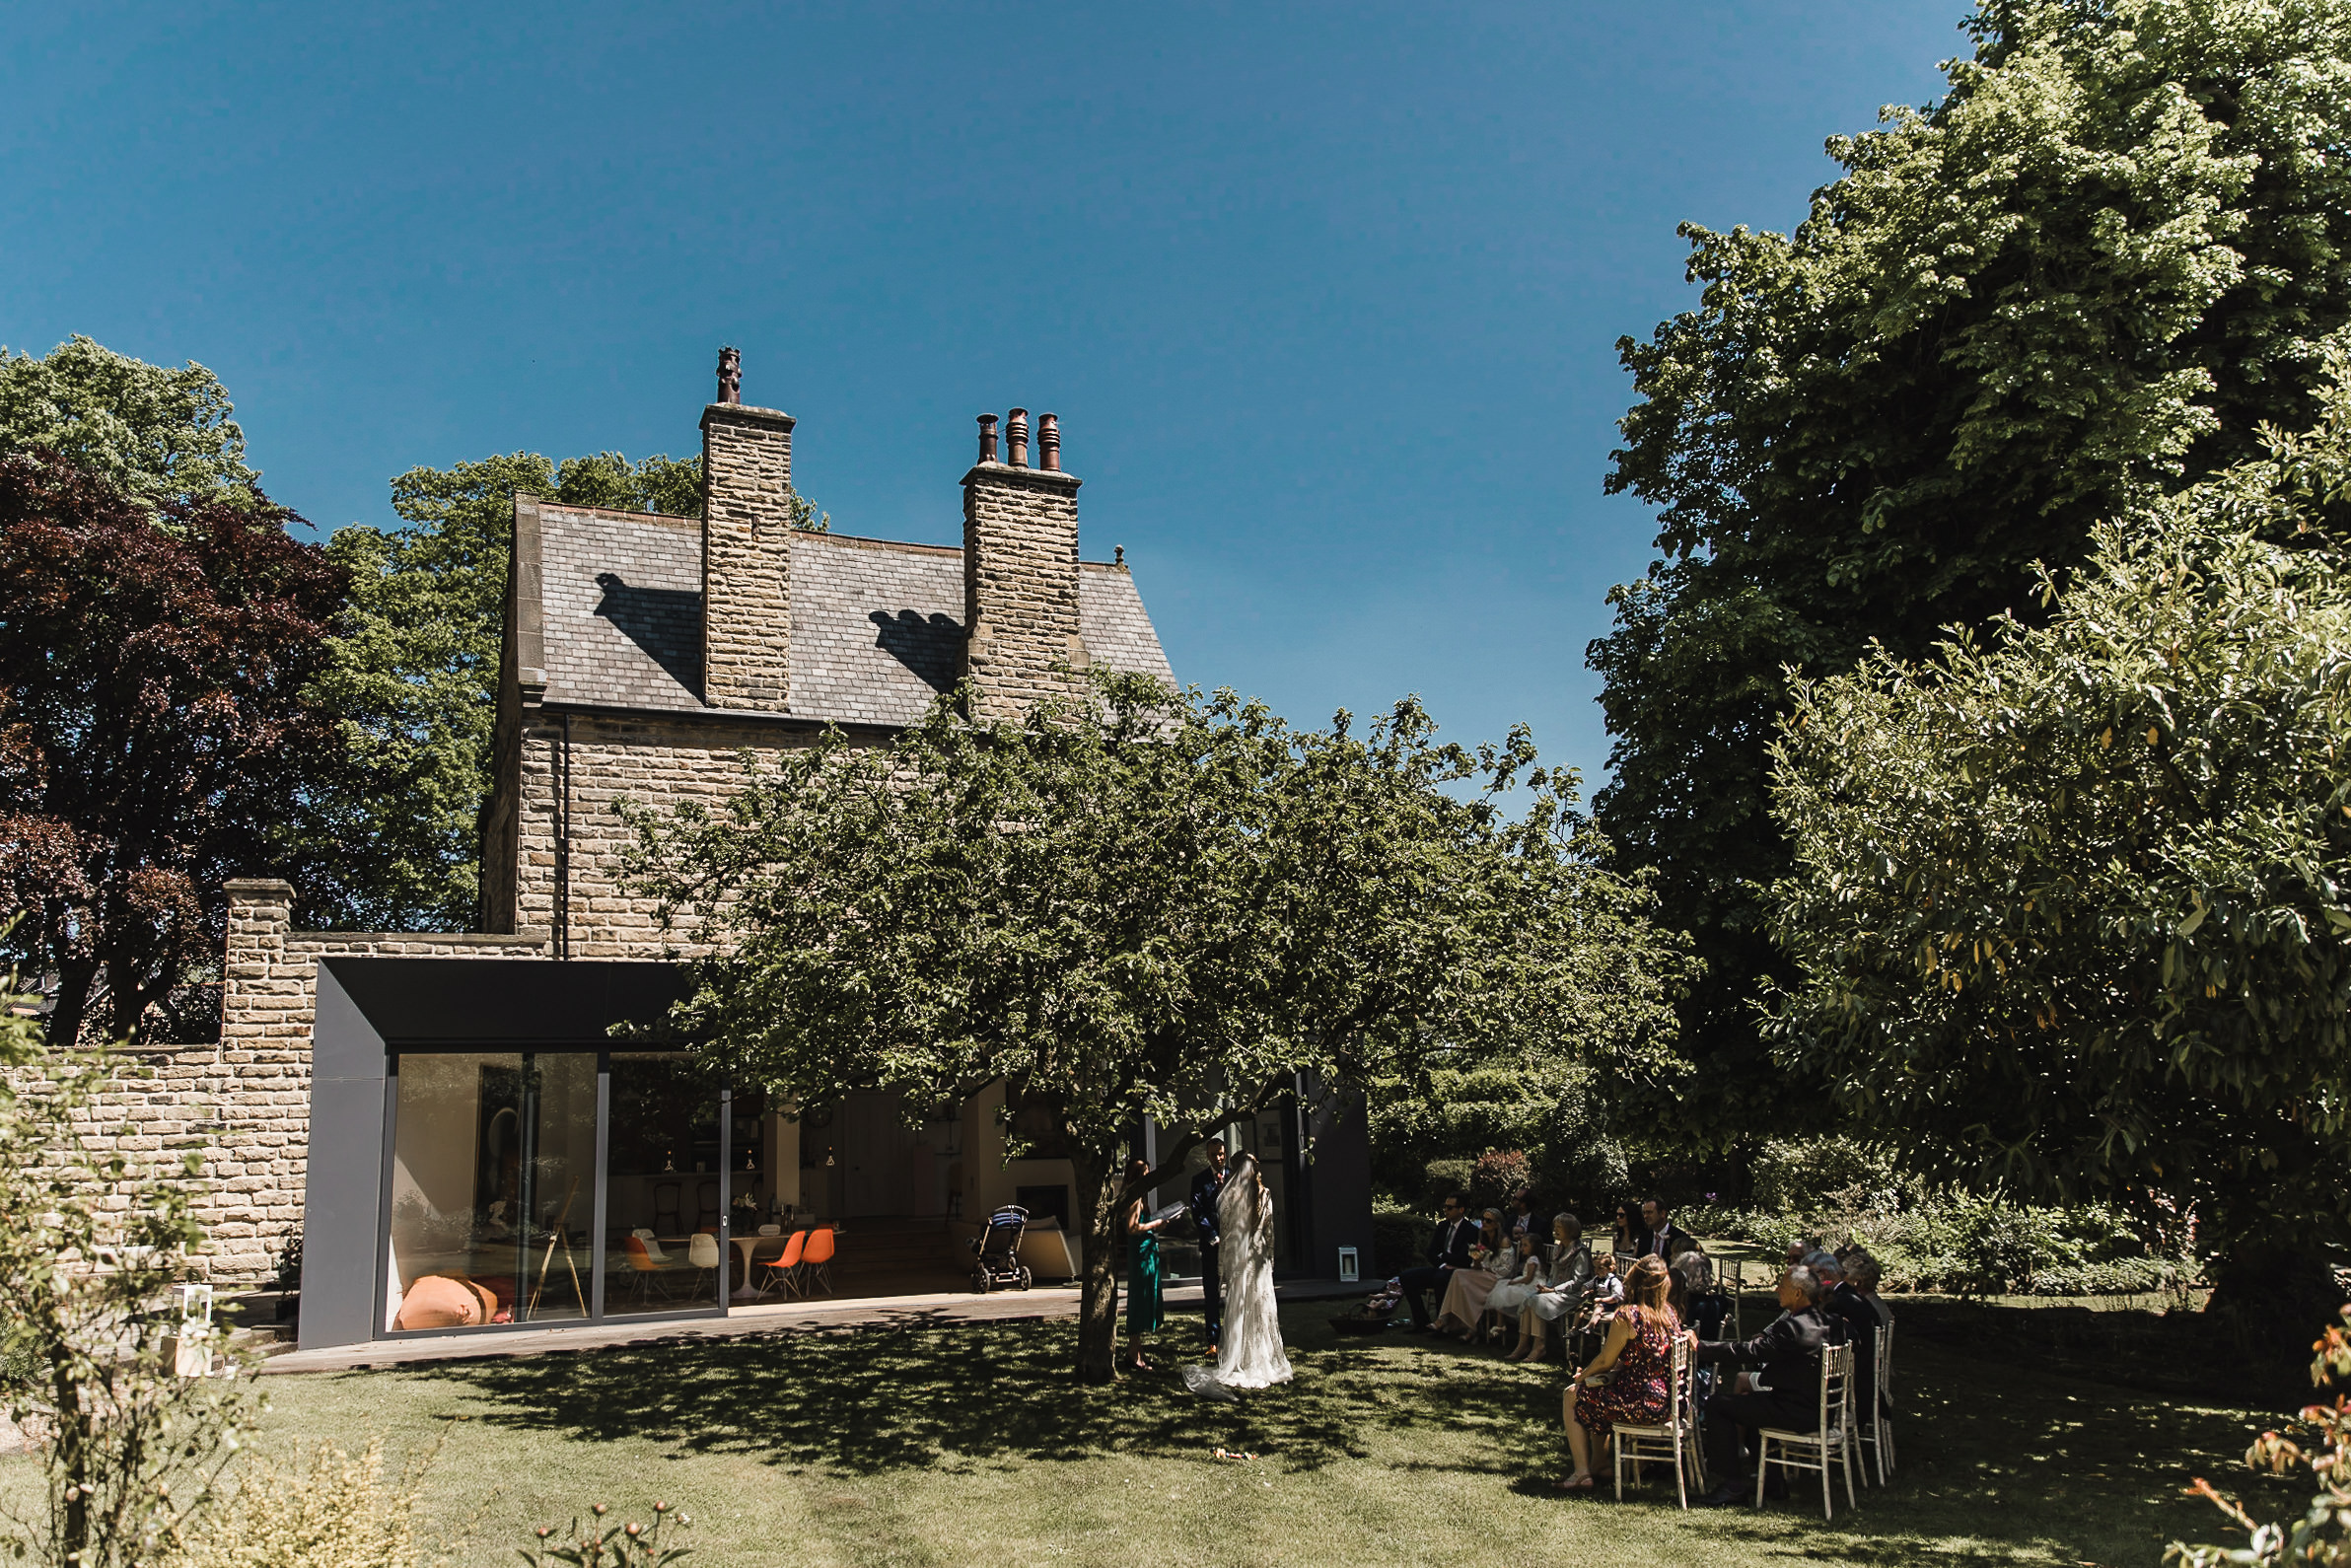 Roundhay-Leeds-Backyard-Wedding-Becs-Chris-088.jpg